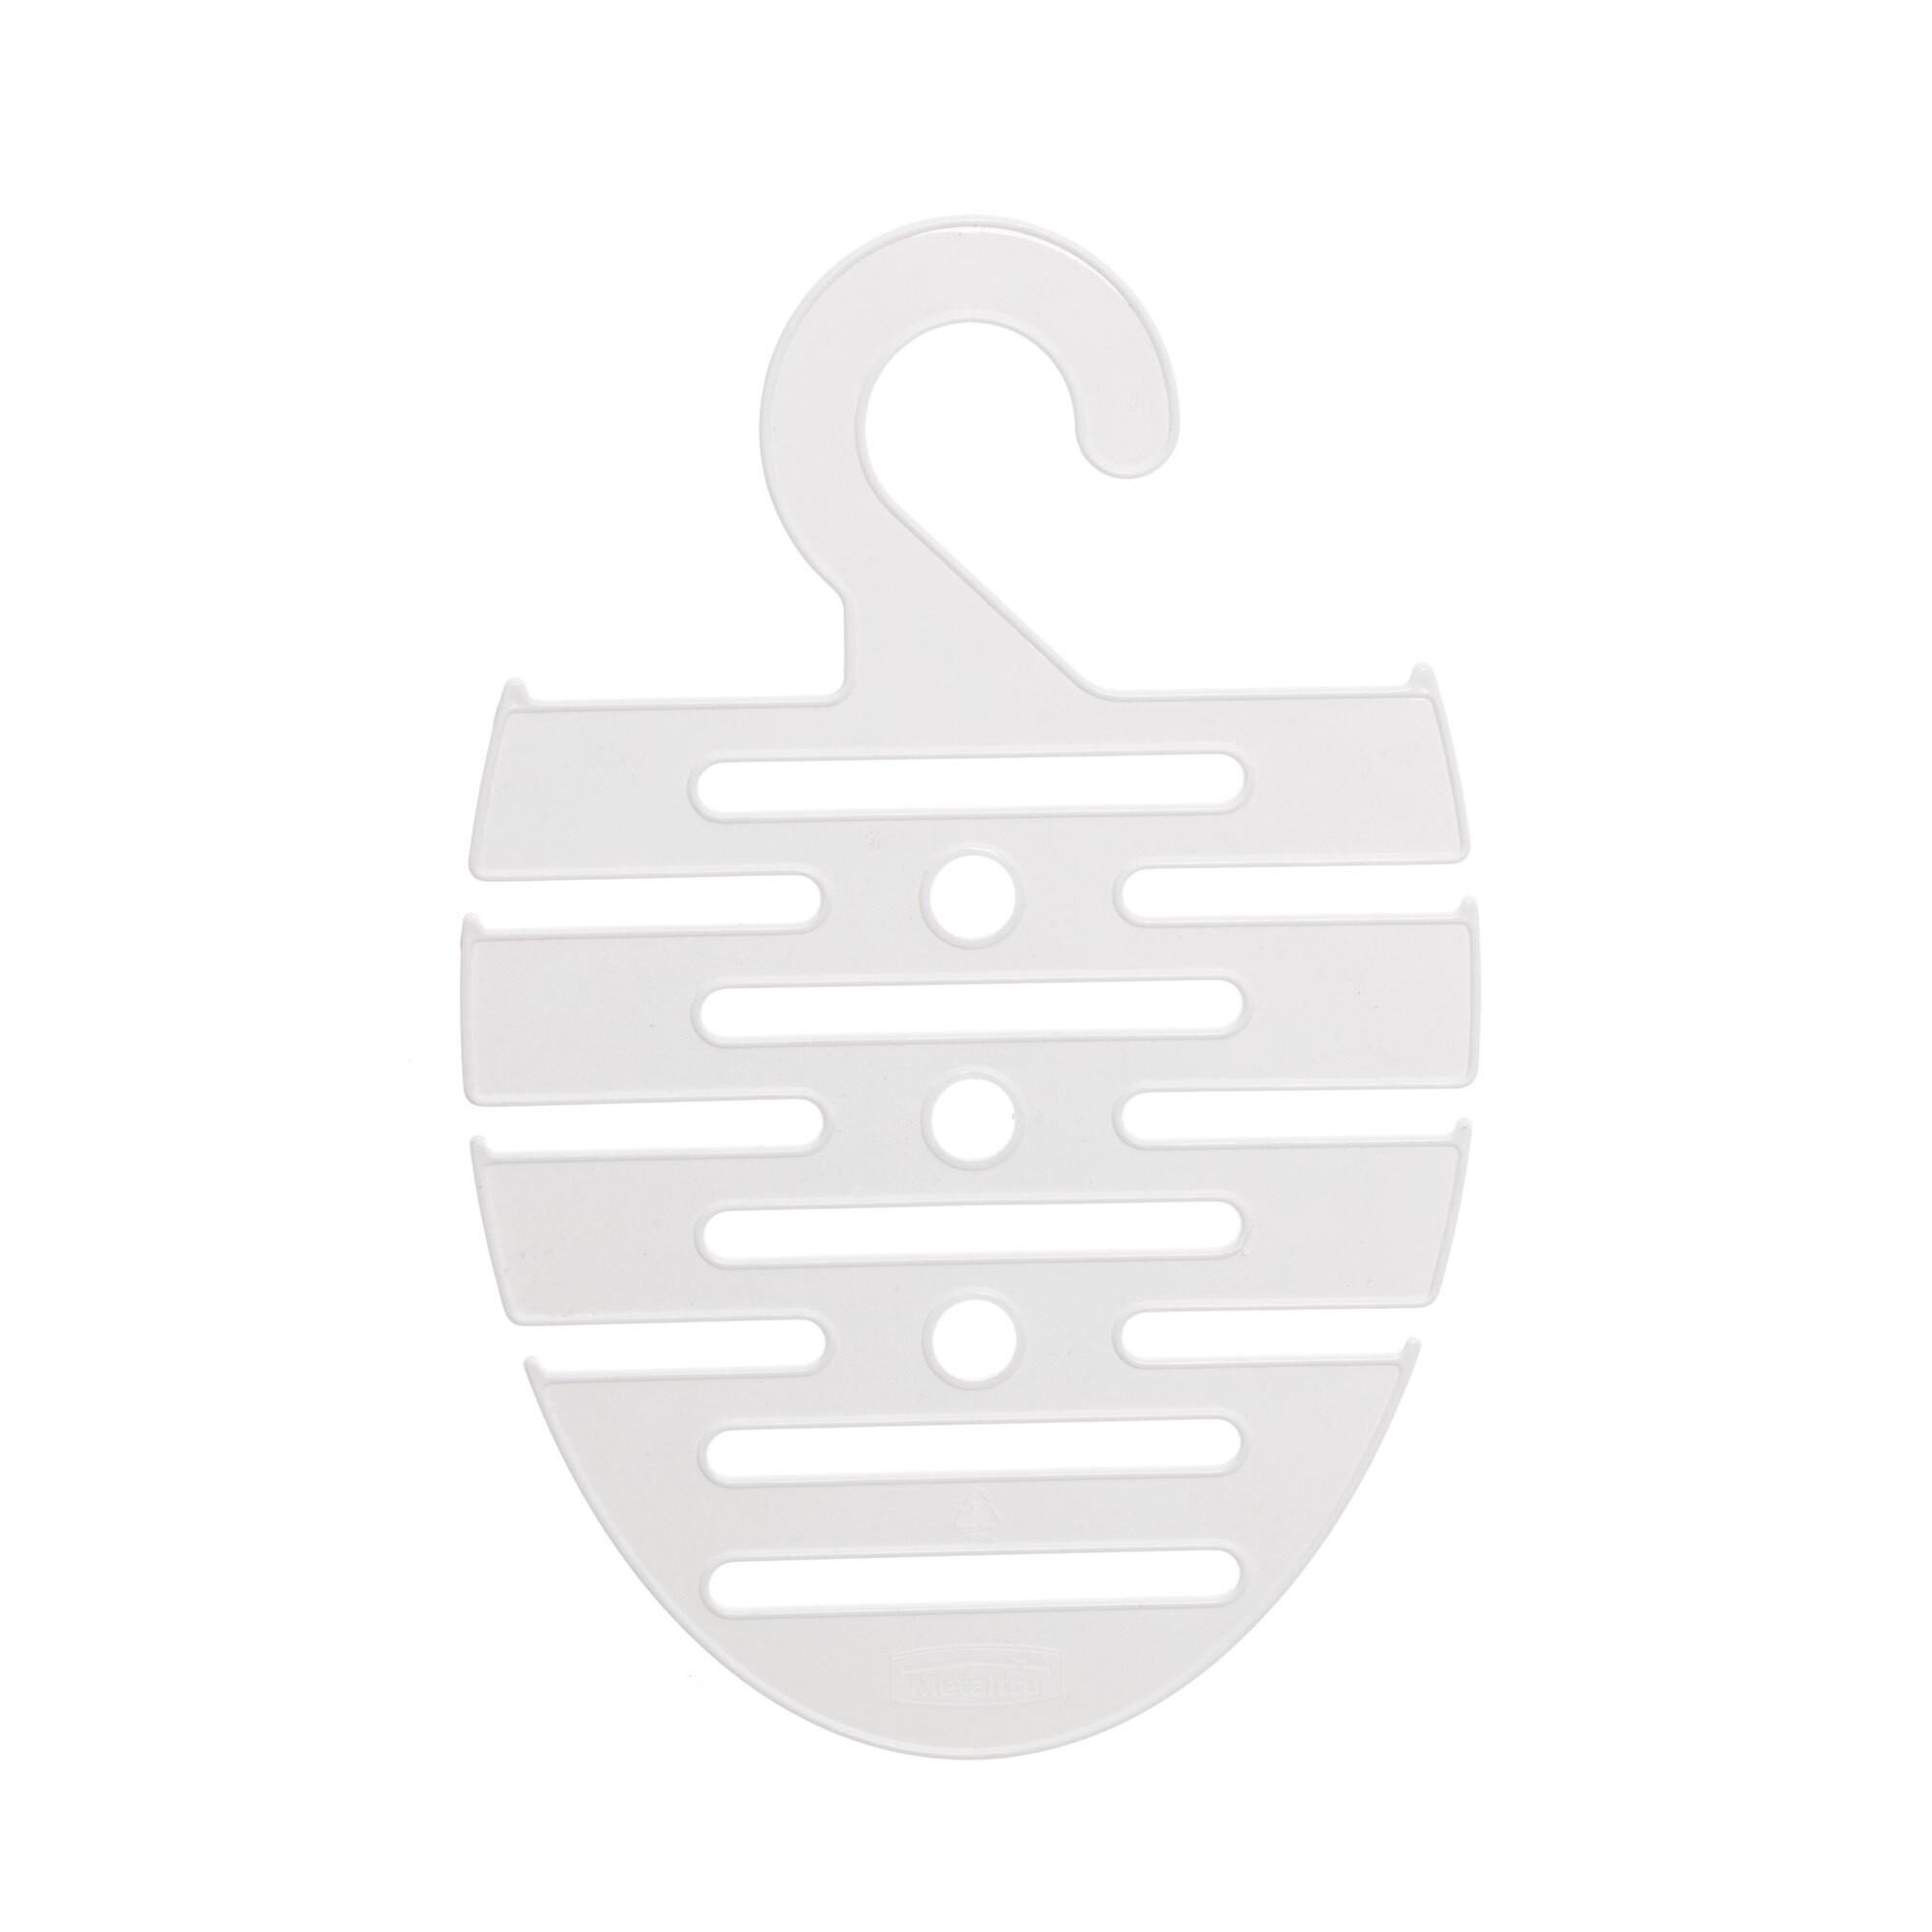 Cabide para Gravata de Plastico 14 cm Branco - Metaltru